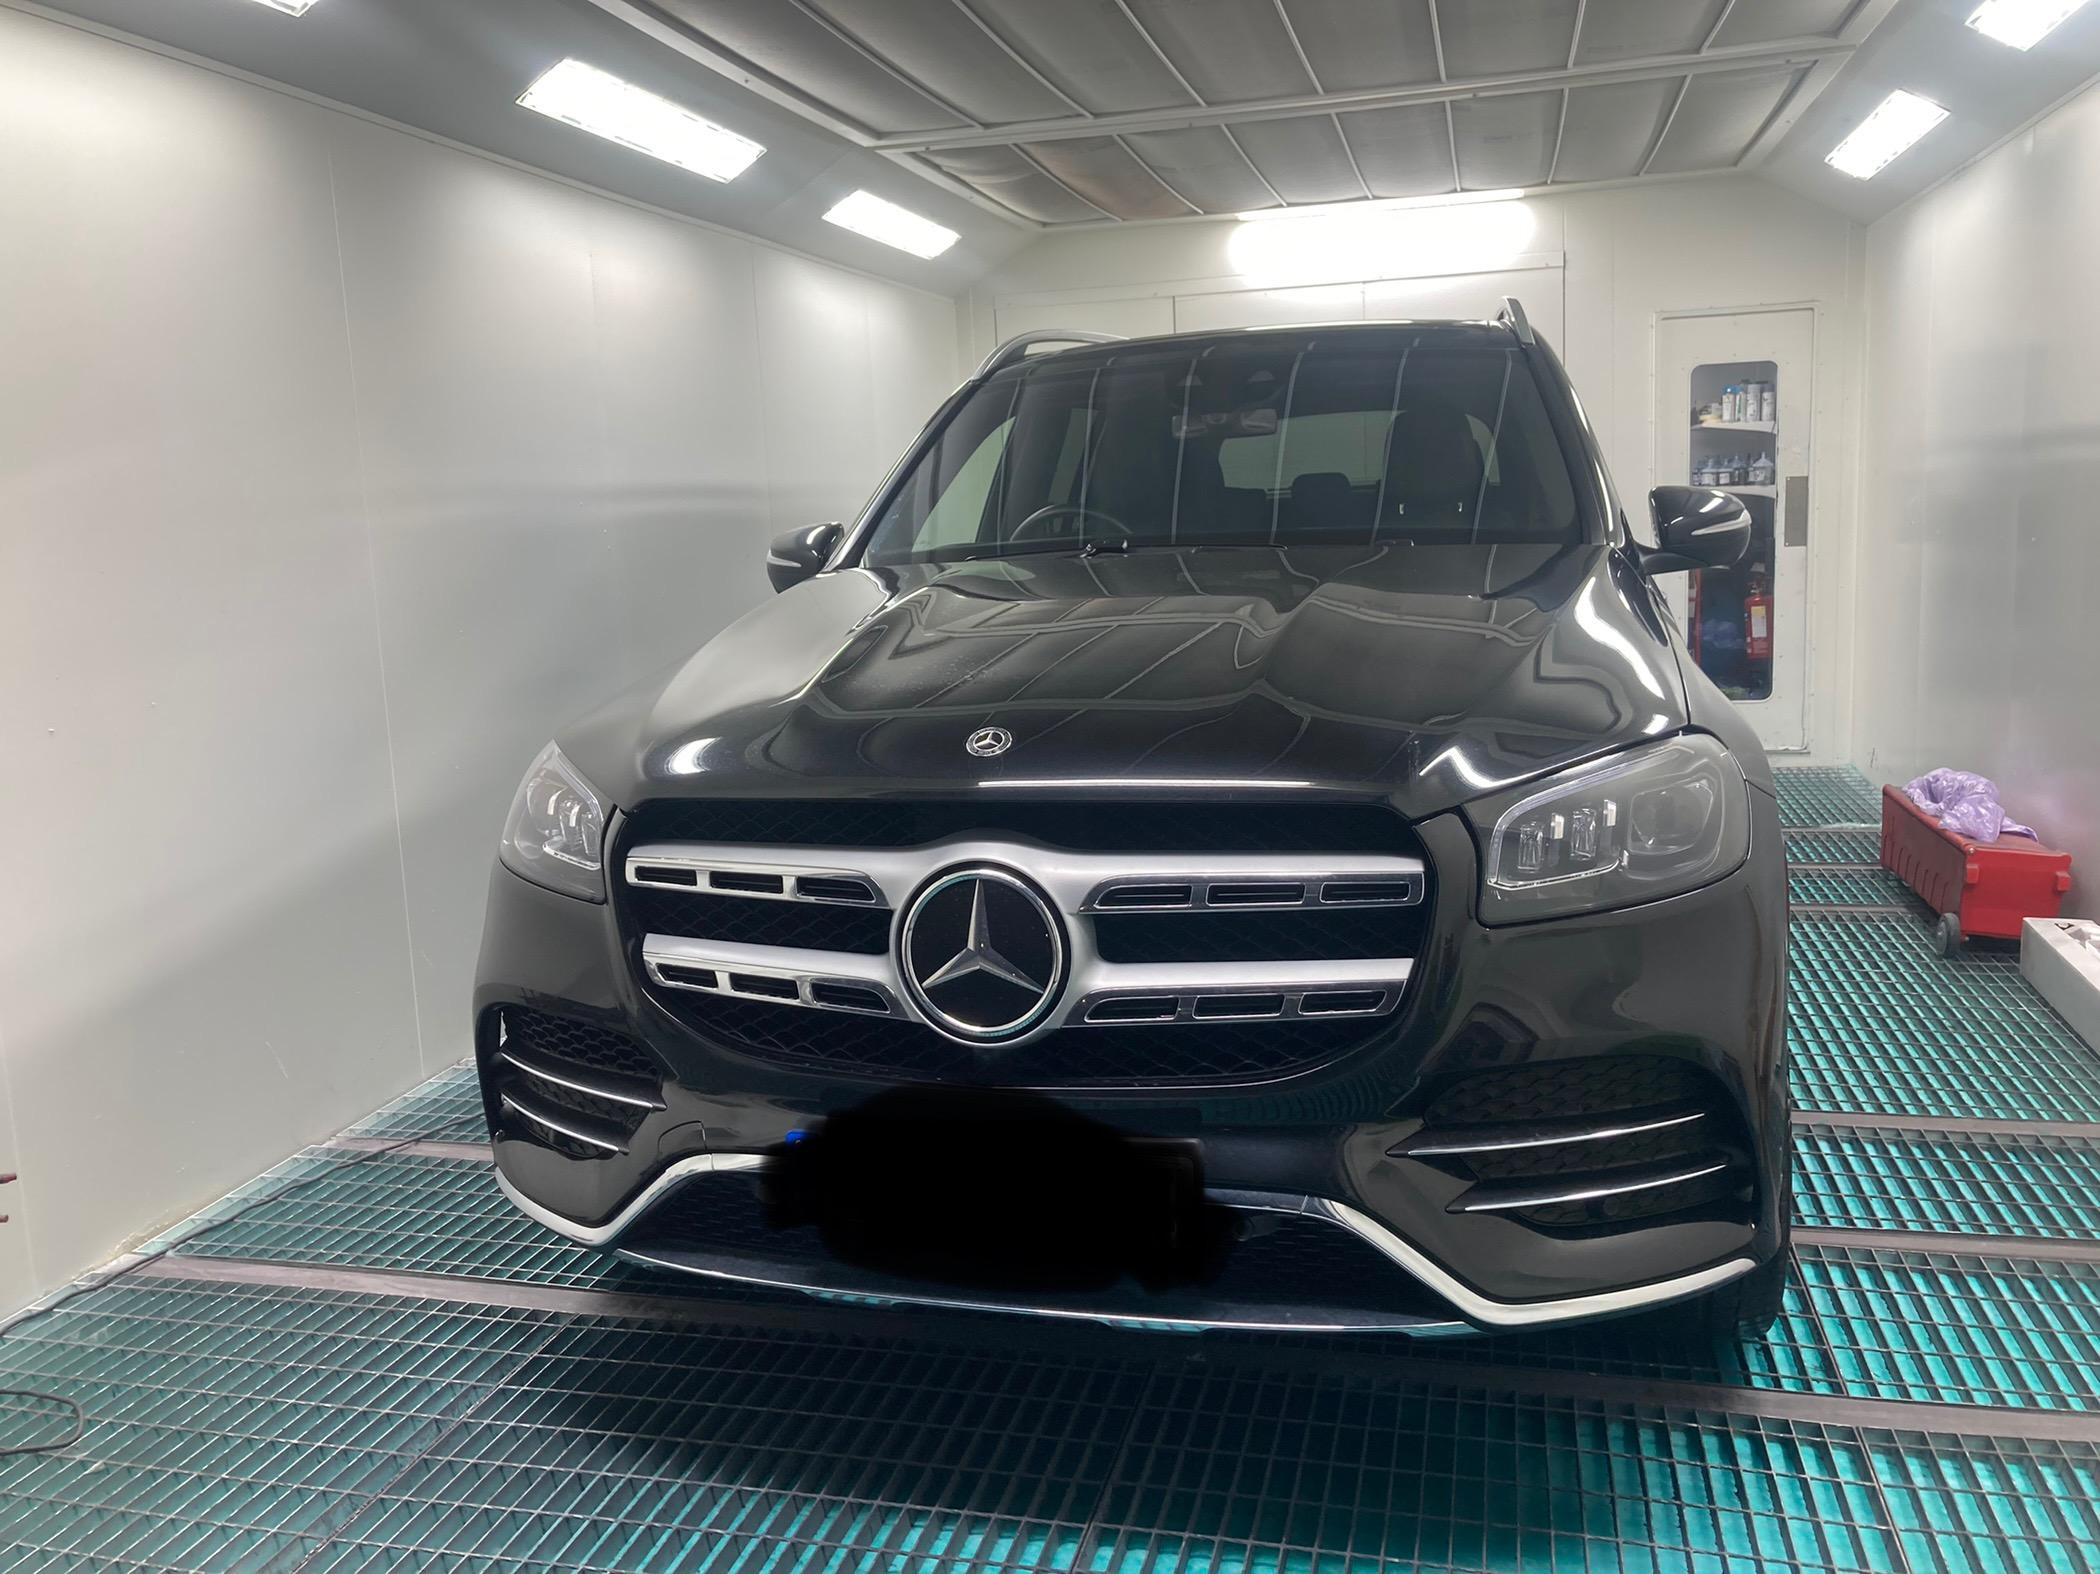 Mercedes GLS painted, polished & re-assembled